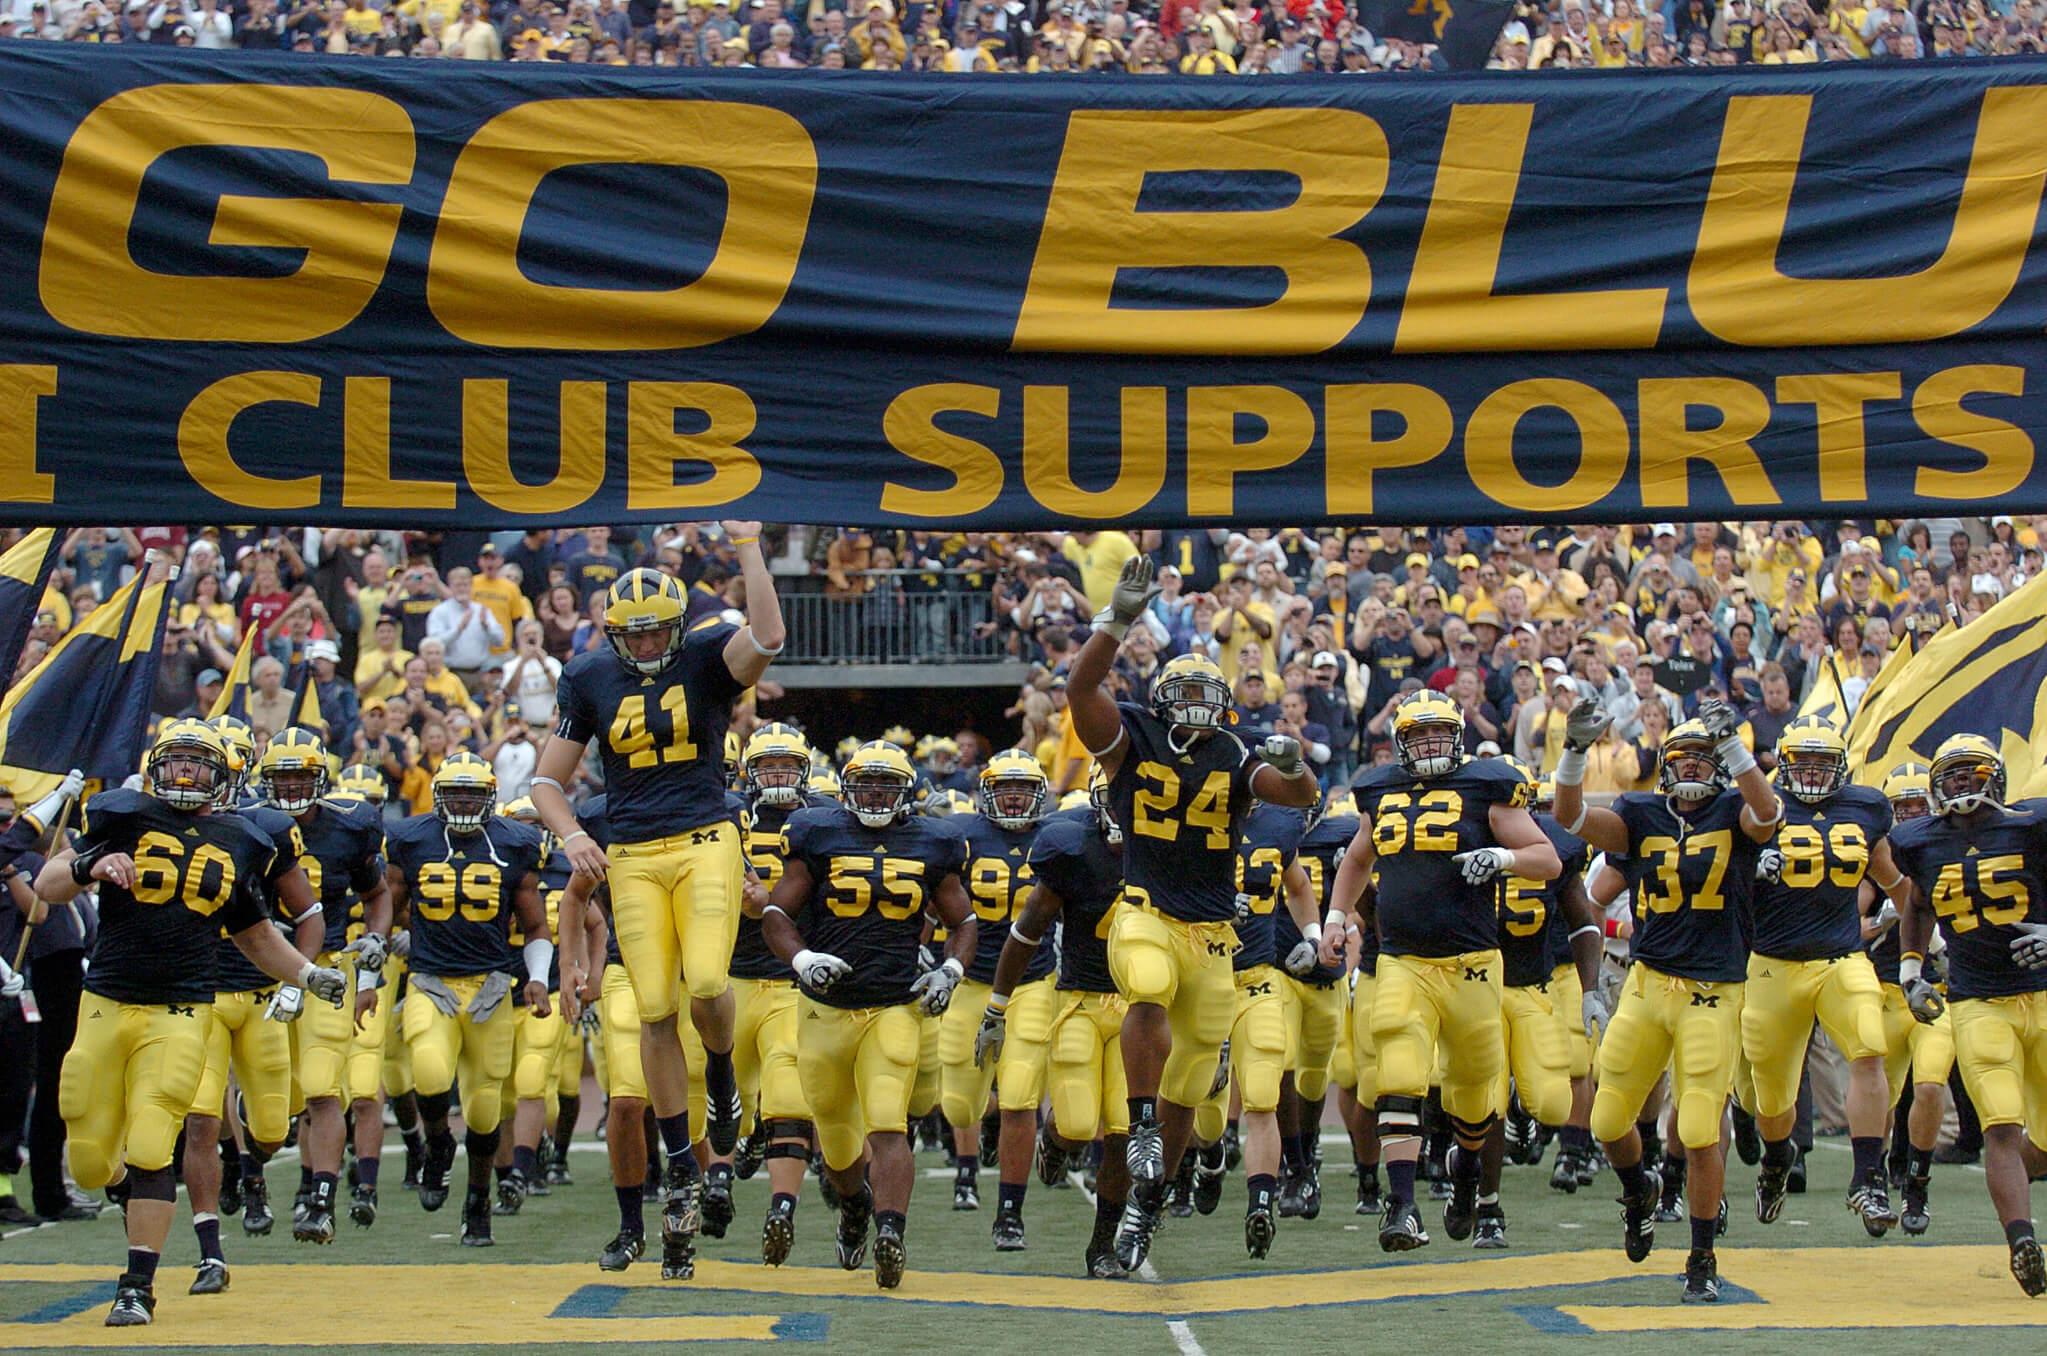 Michigan Wolverines Go Blue Banner run entrance